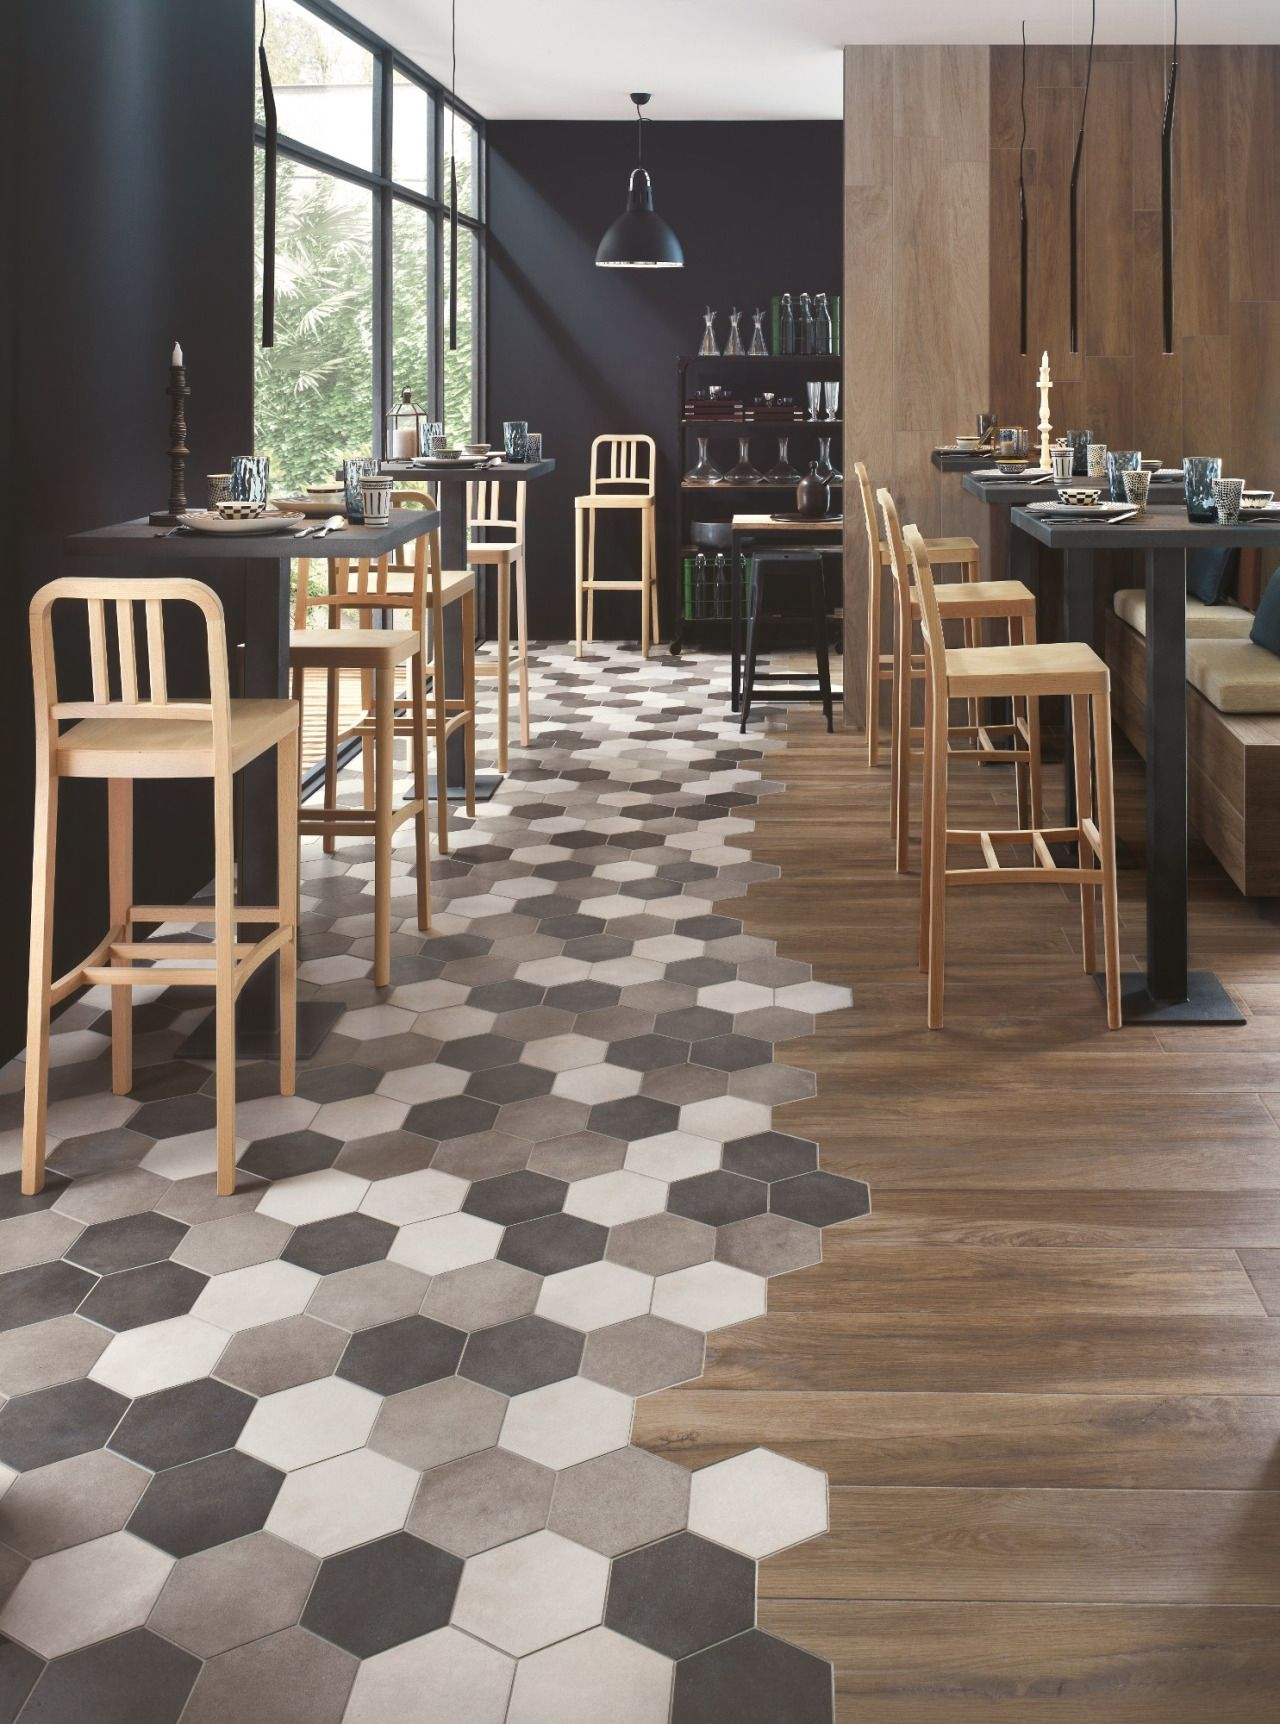 archiproducts | Floors | Pinterest | Pavimenti, Piastrella e ...